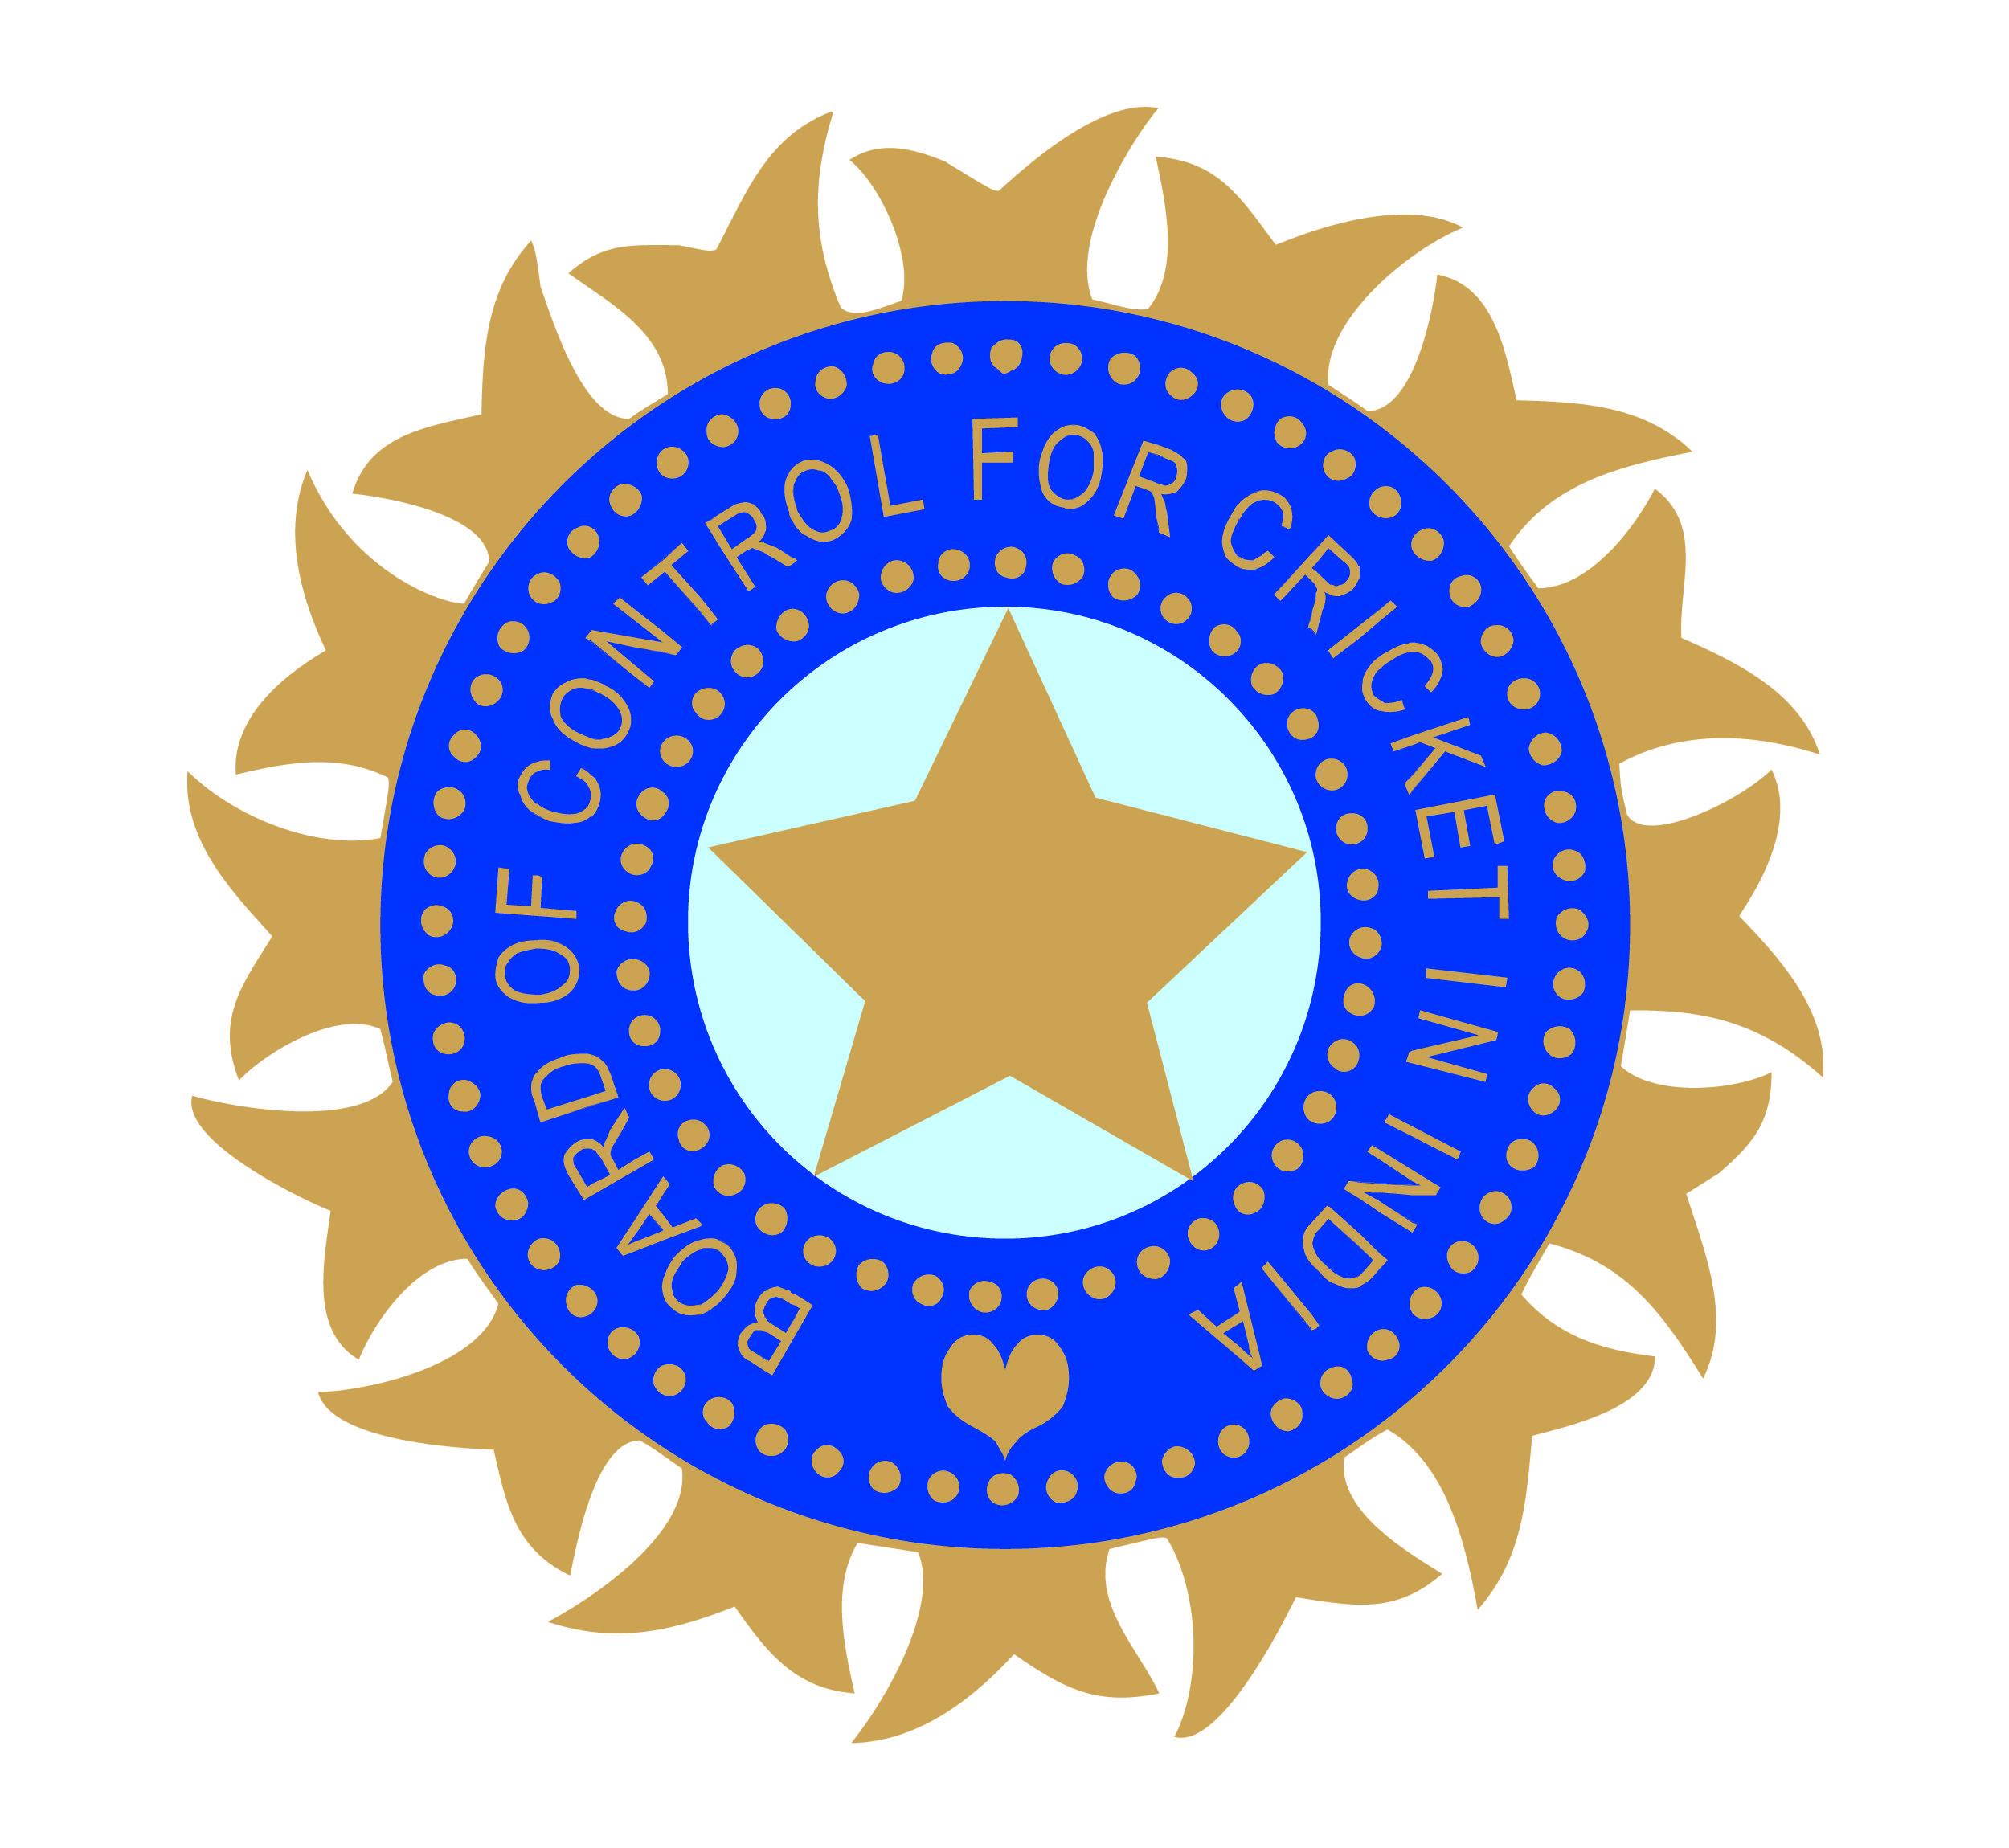 Indian Cricket Team Logo Google Search Cricket In India India Cricket Team Cricket Teams